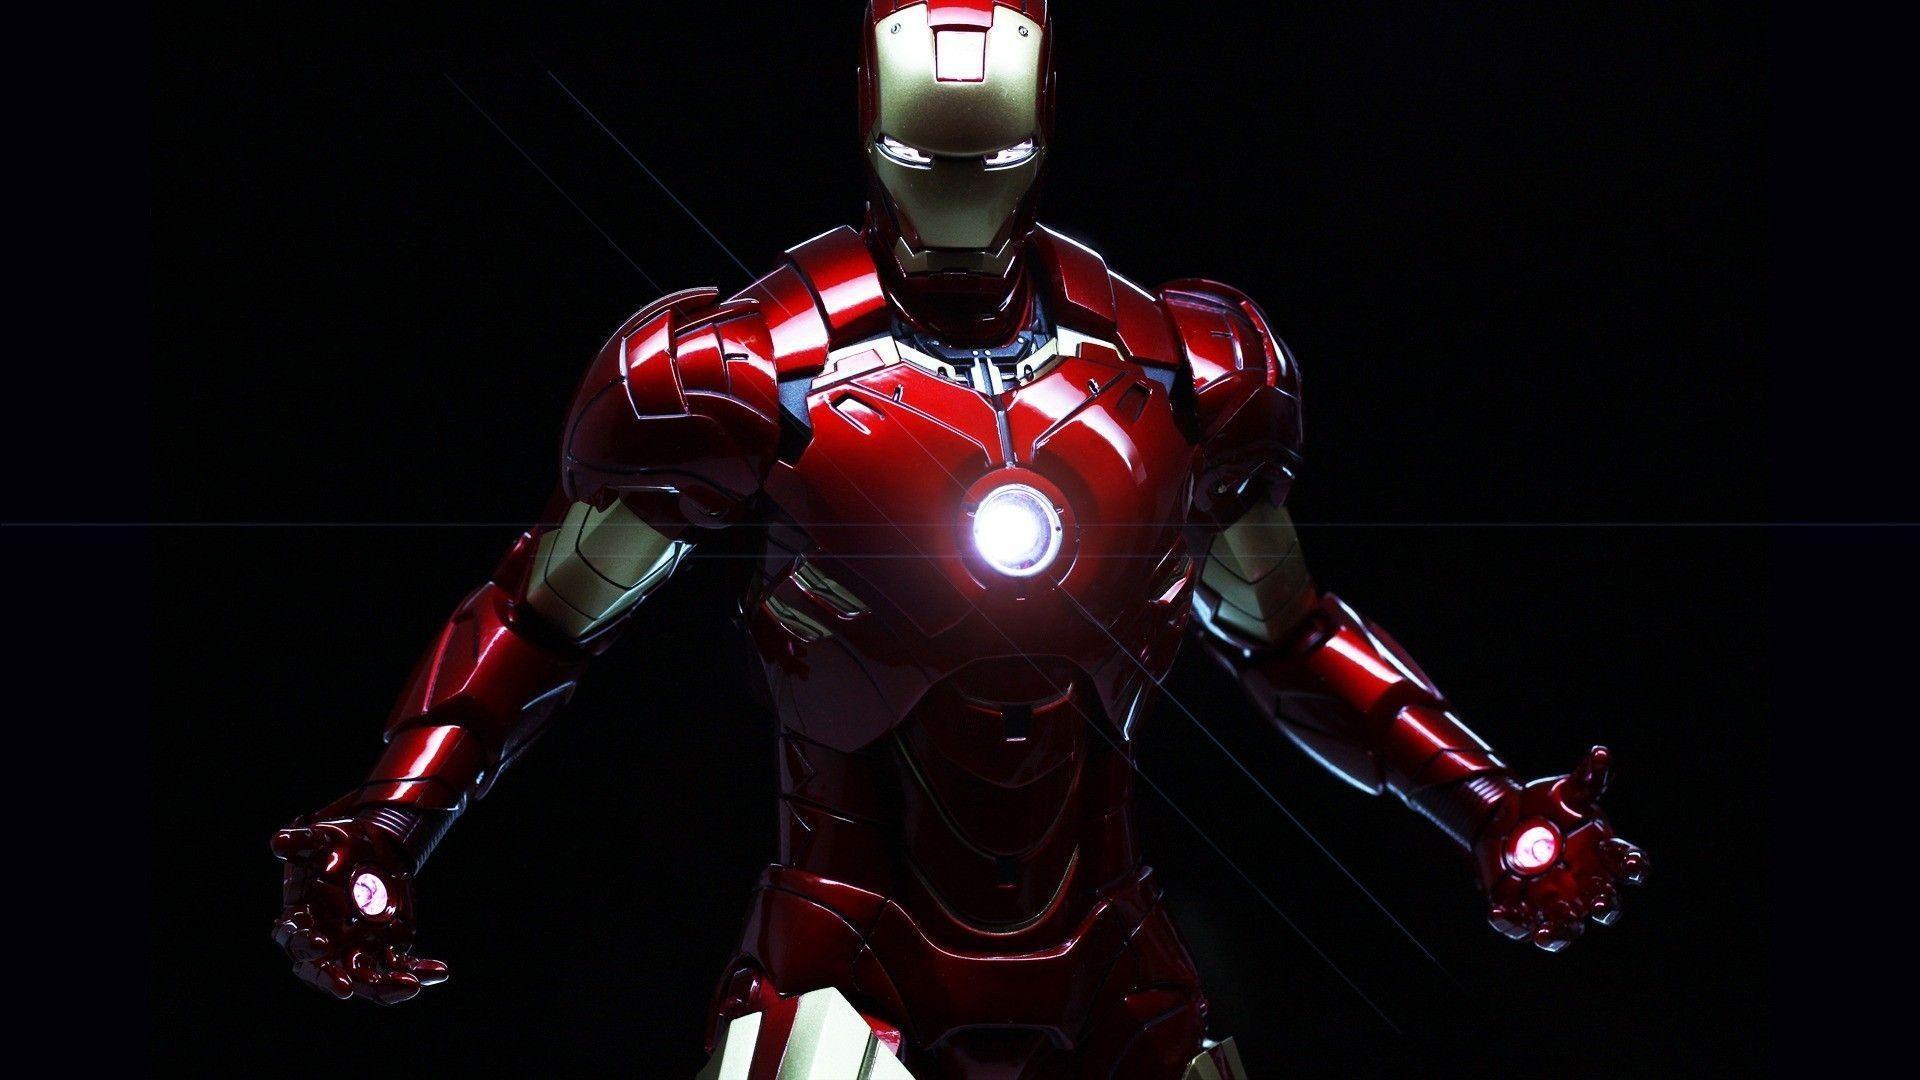 Iron Man Armor Wallpapers